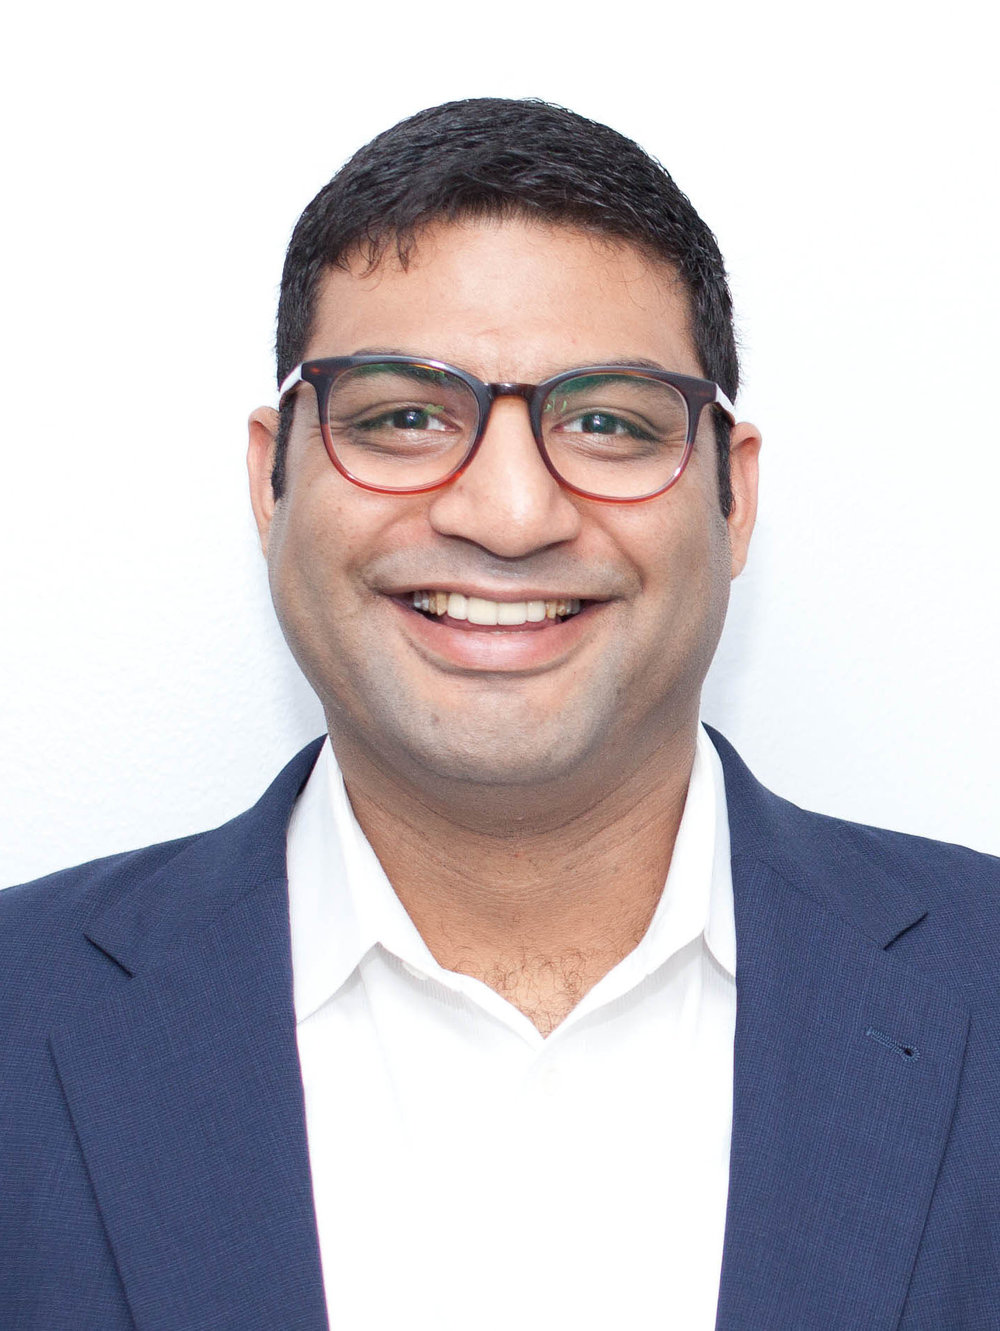 Amin Noorani, Director of Lending